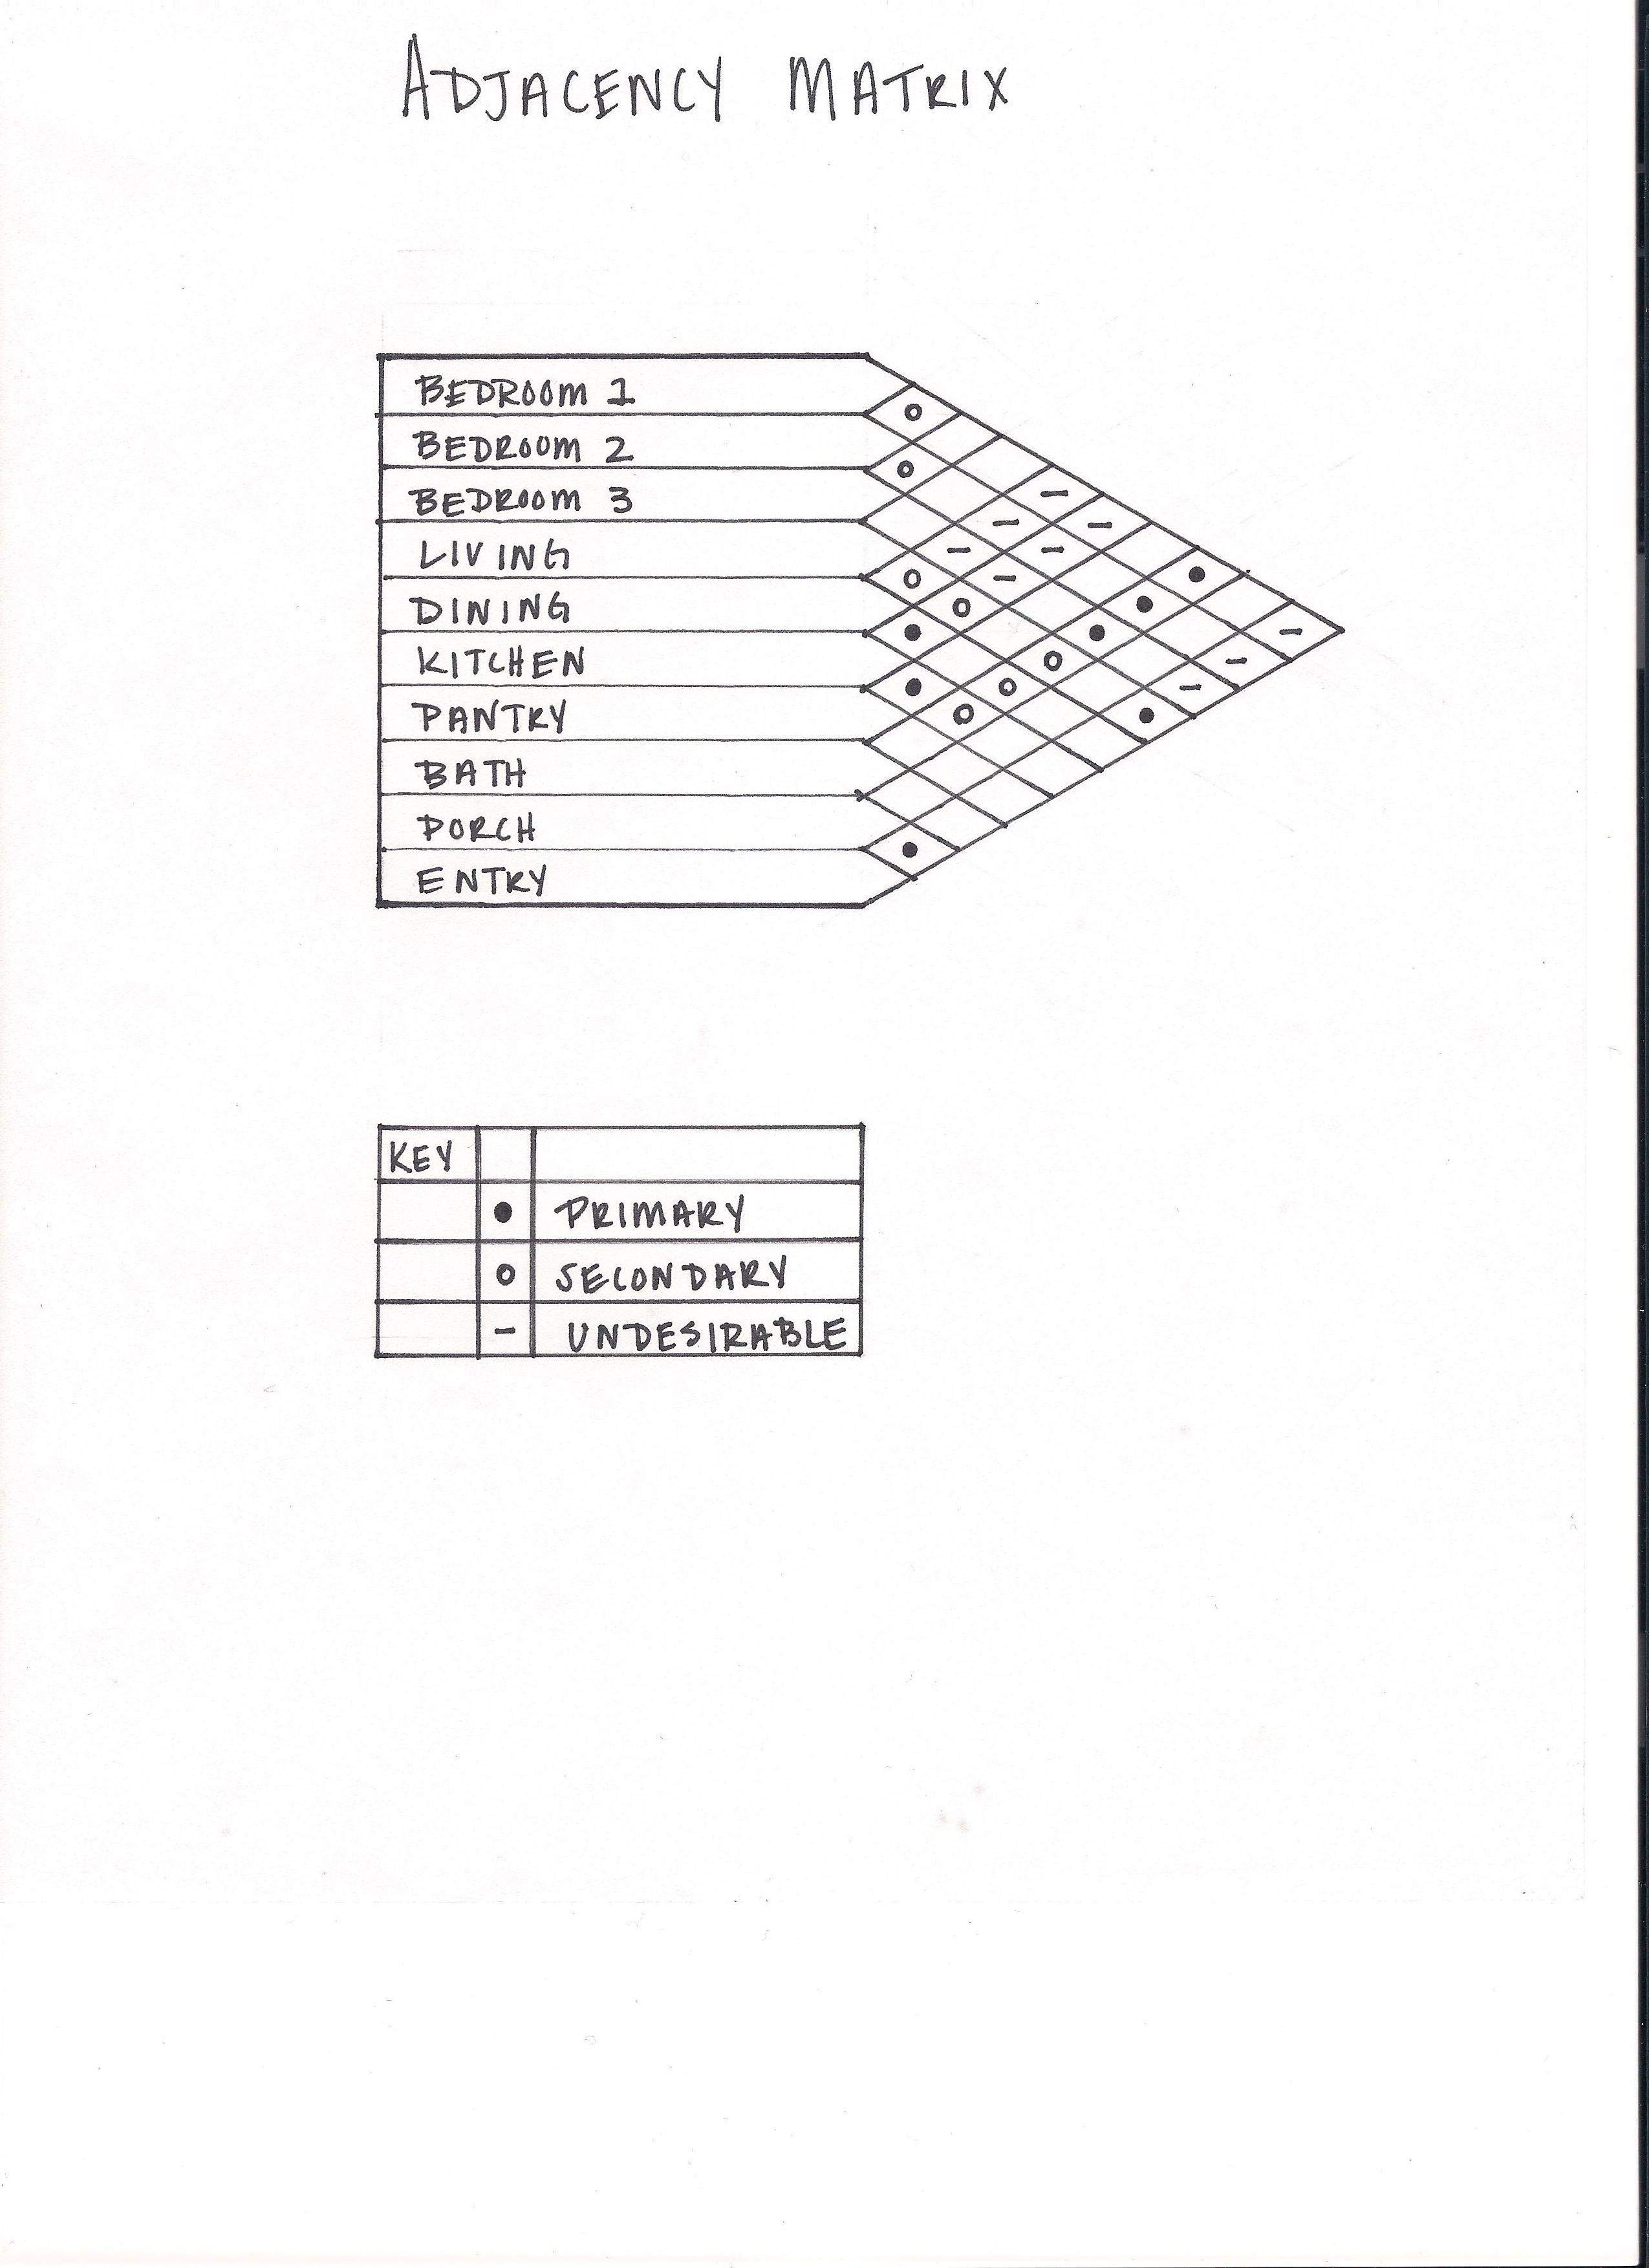 Matrix Adjacency Excel Template